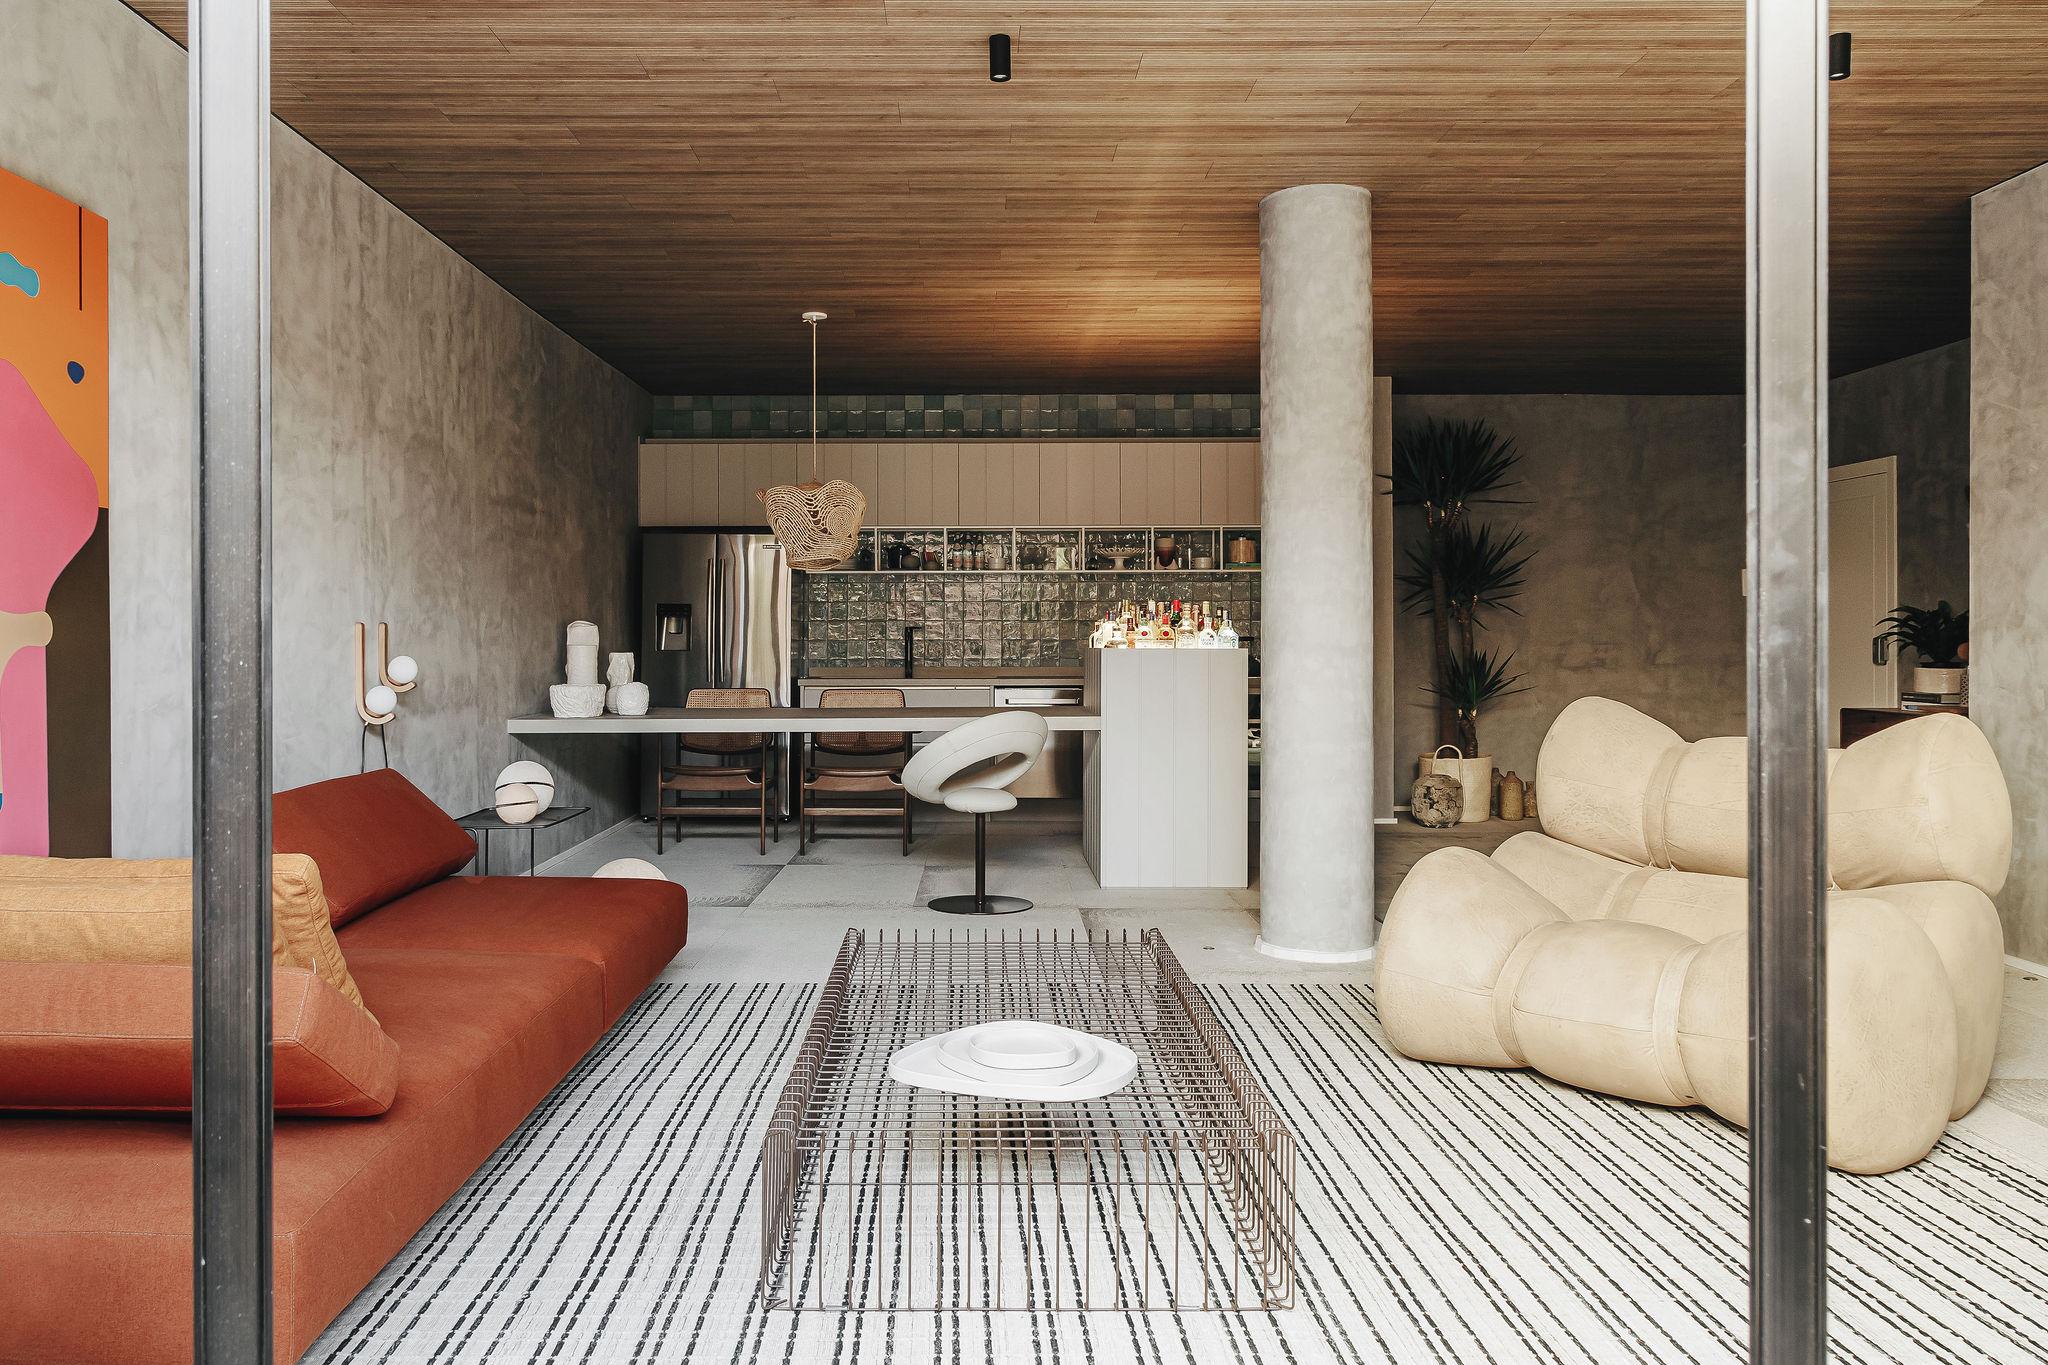 Architetonika Nomad casacor paraná 2021 loft com varanda